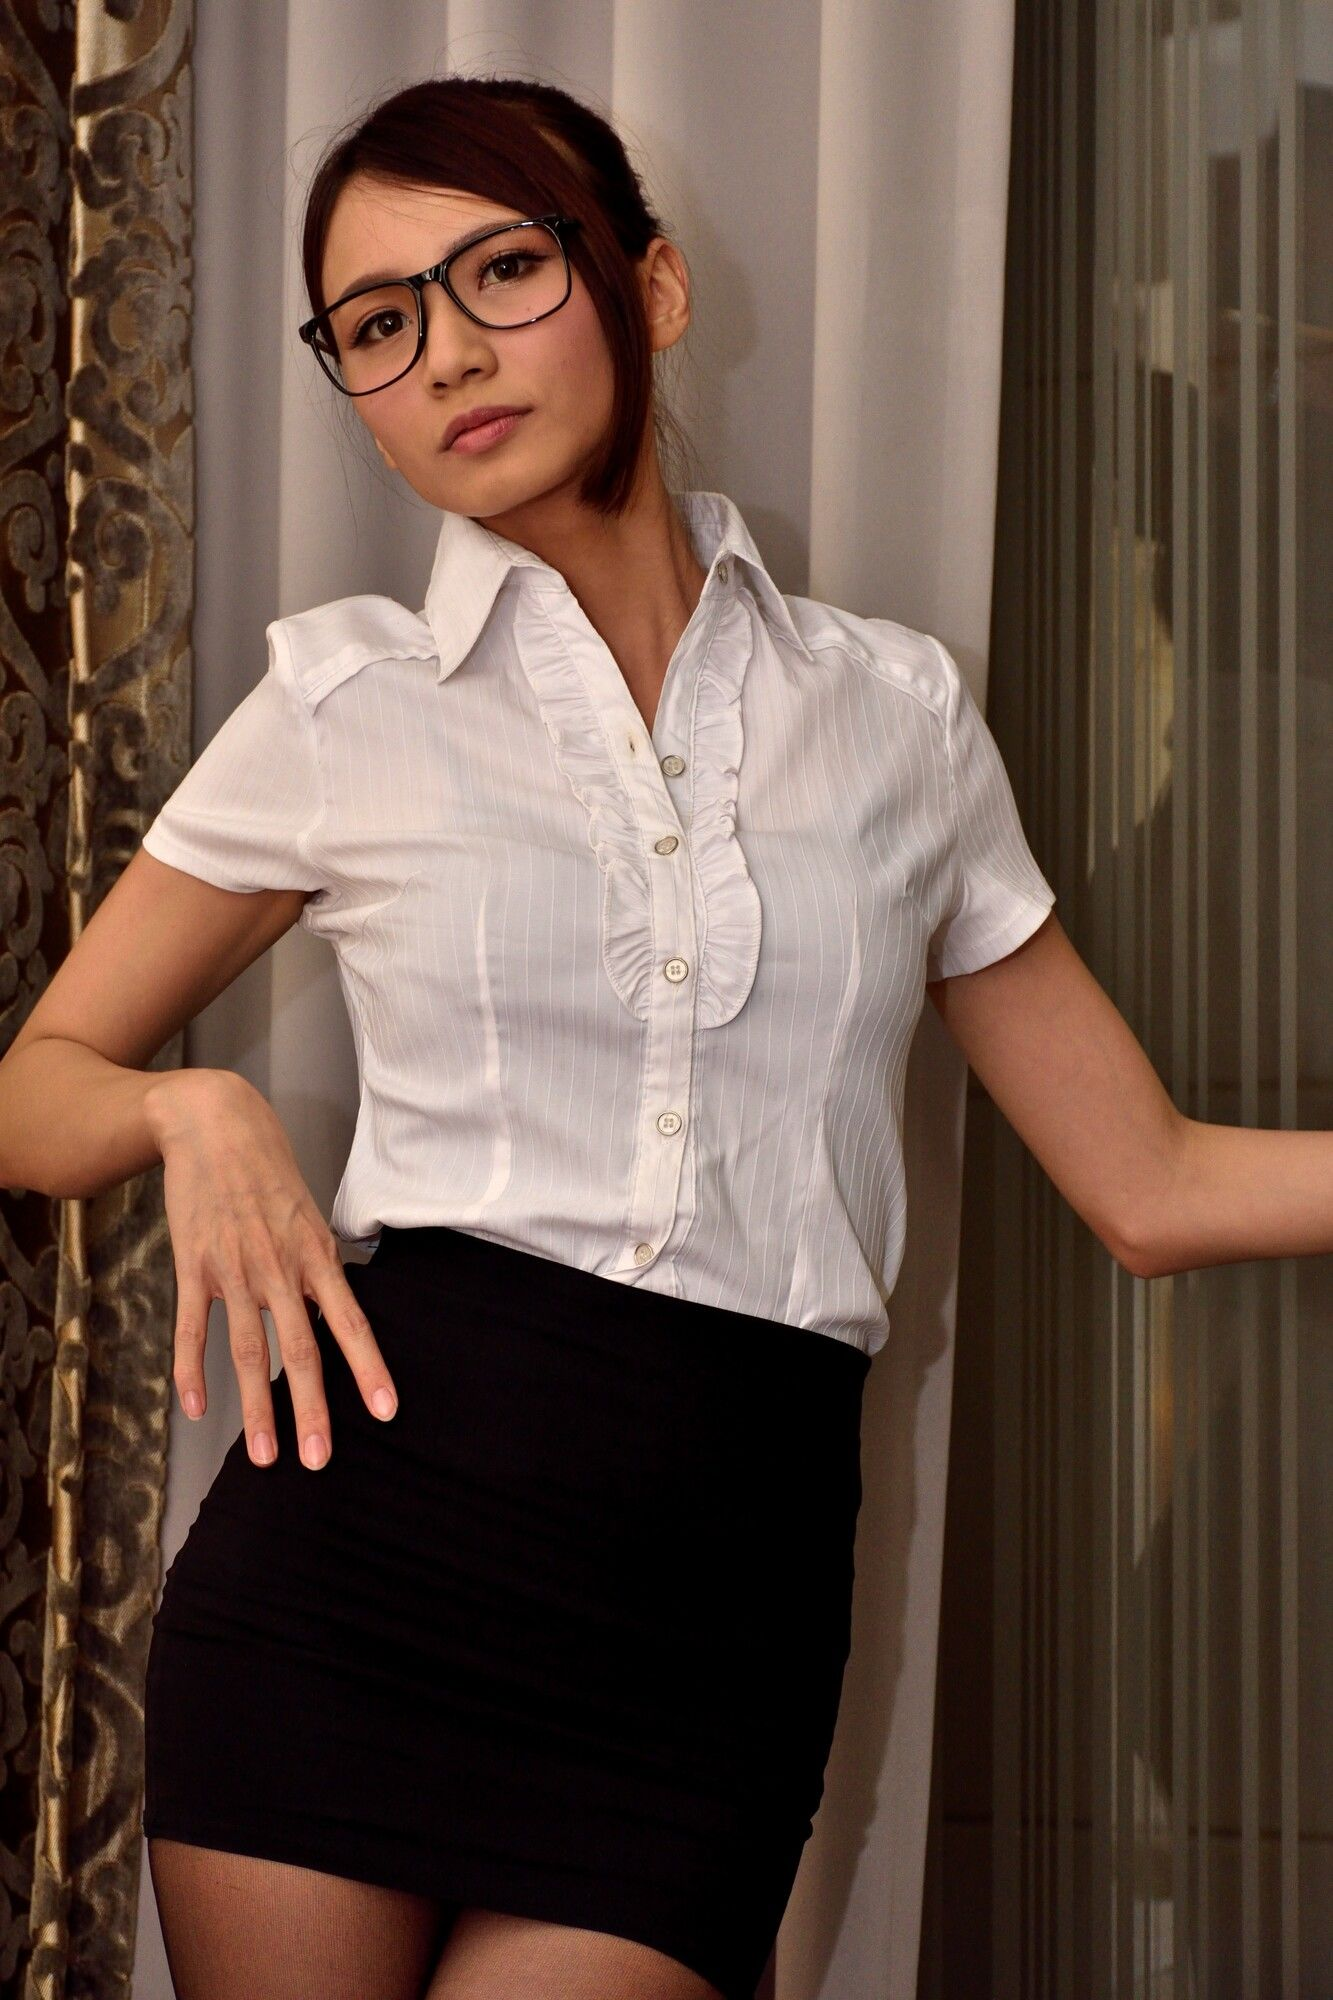 VOL.158 [台湾正妹]嫩模长腿美女:蔡译心(Candice)超高清个人性感漂亮大图(53P)